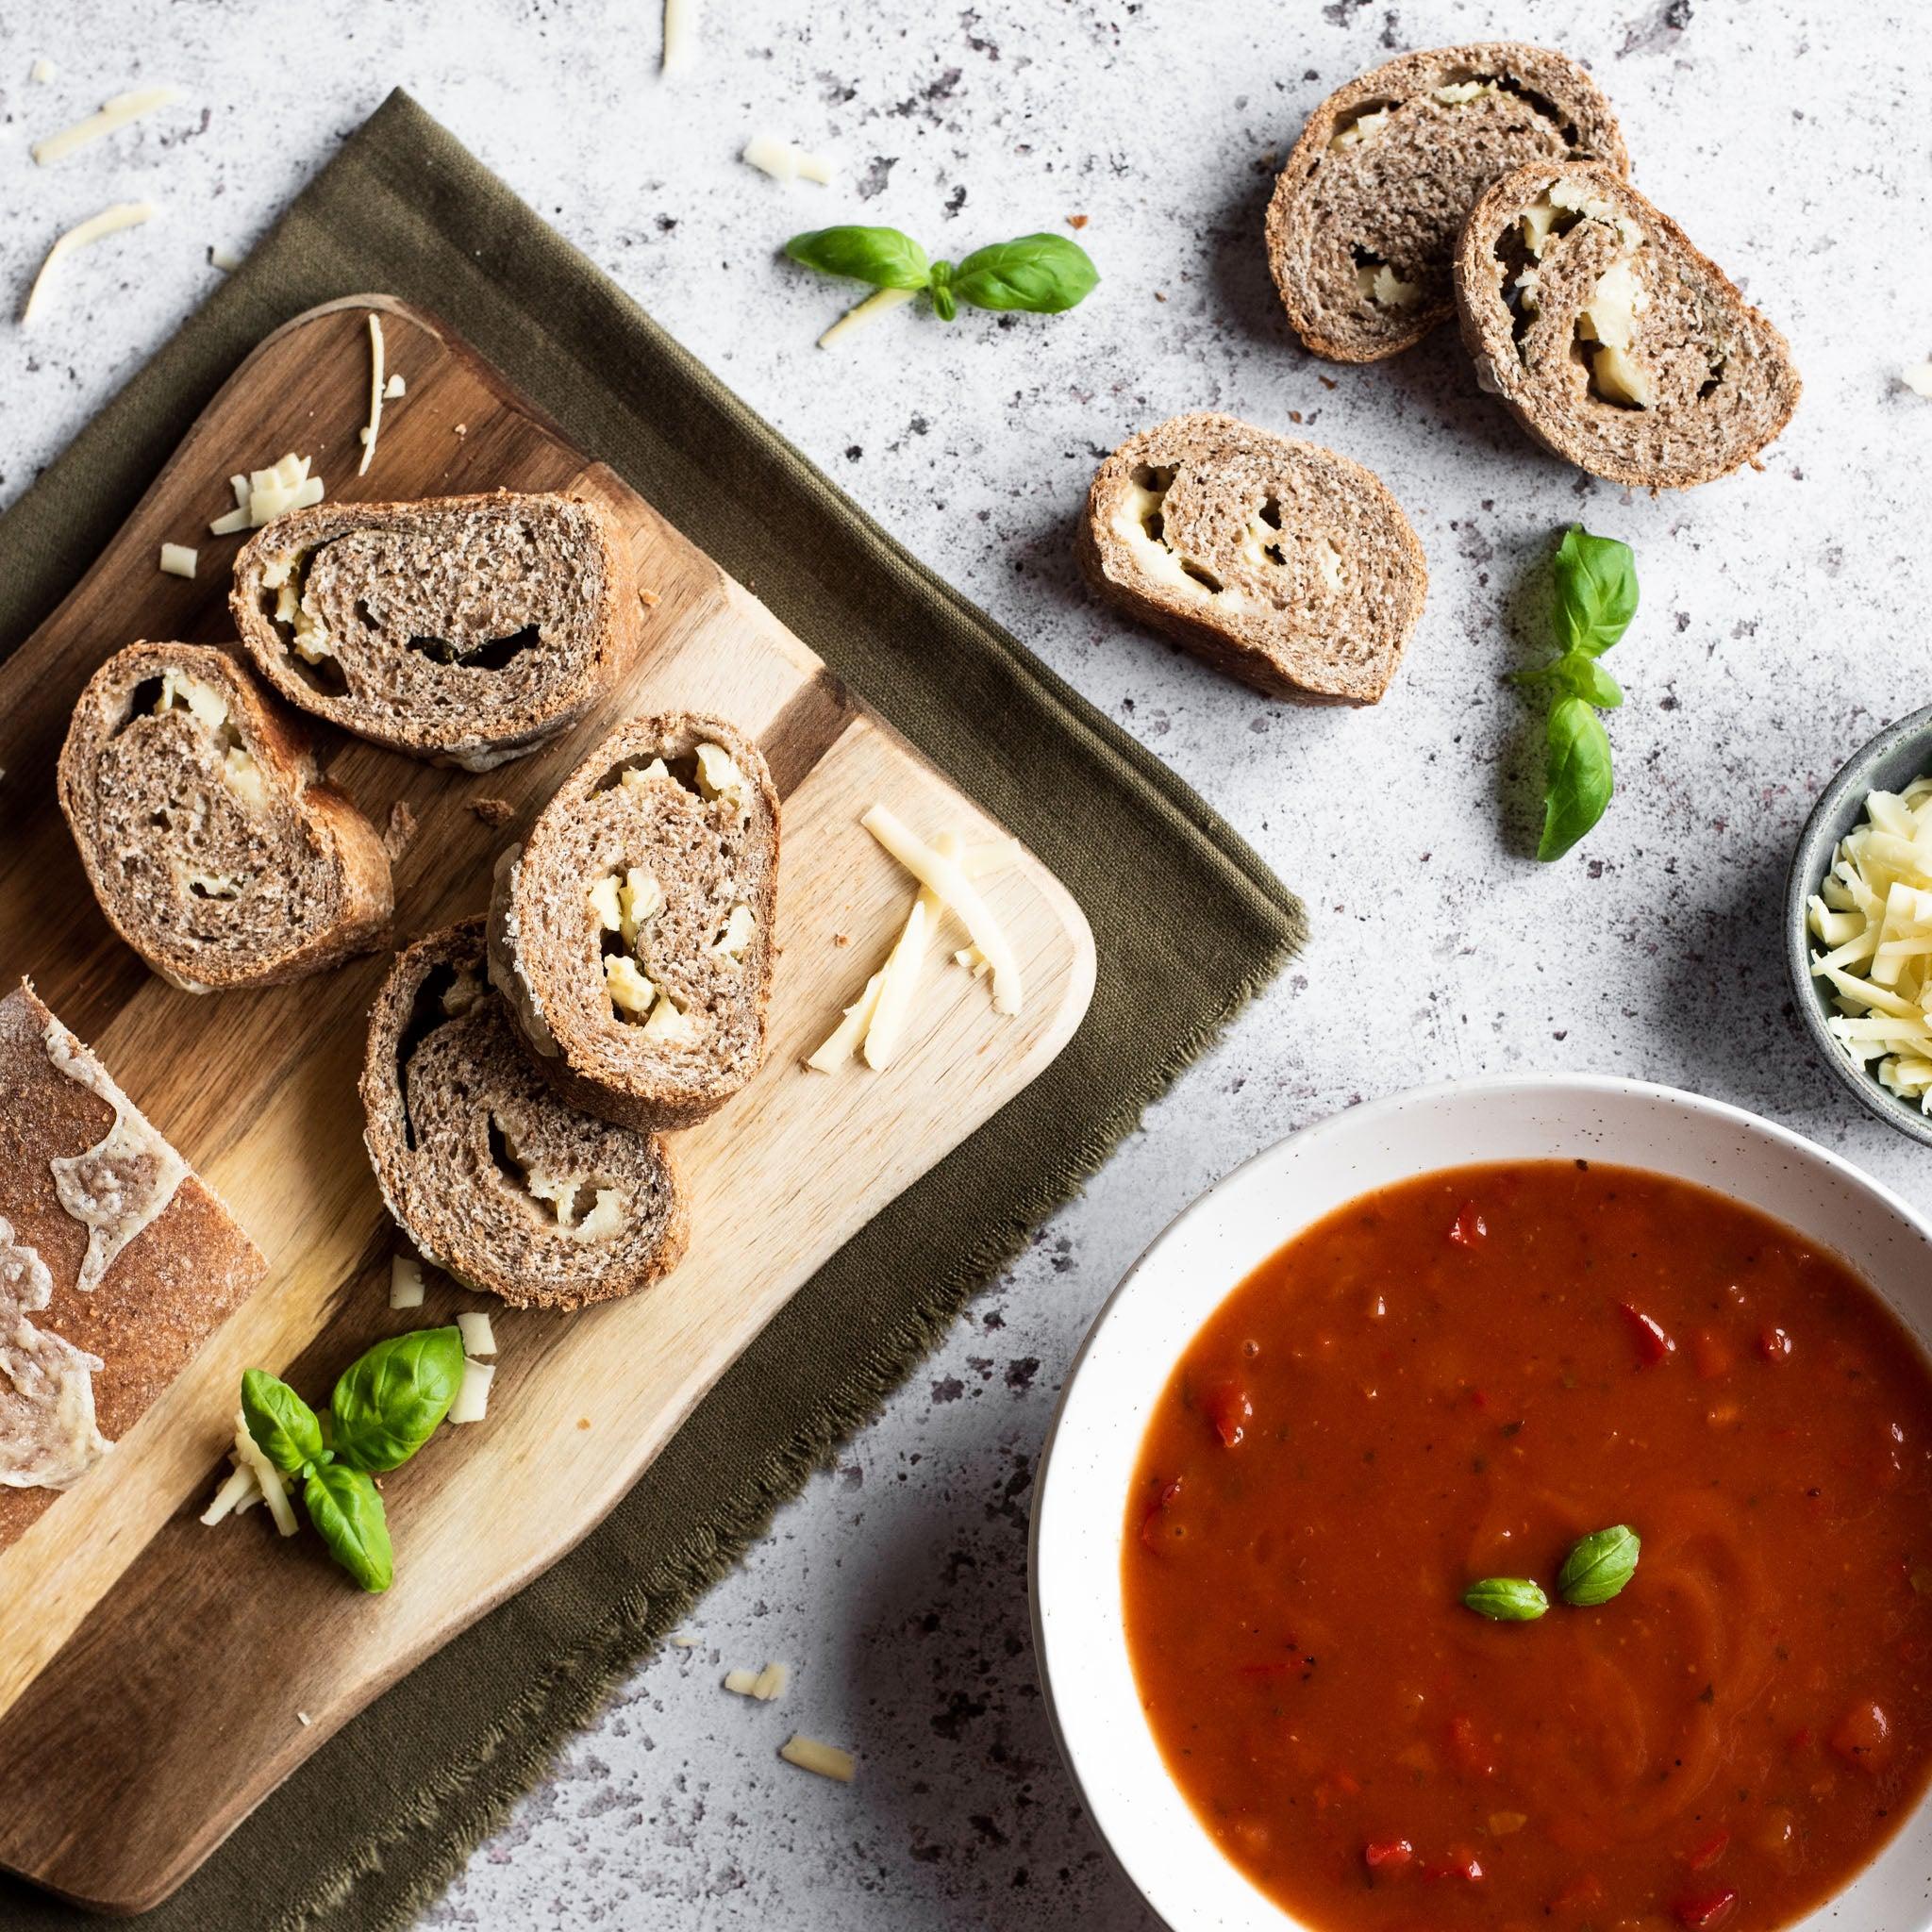 Cheese-and-Basil-Pinwheel-Bread-SQUARE-4.jpg